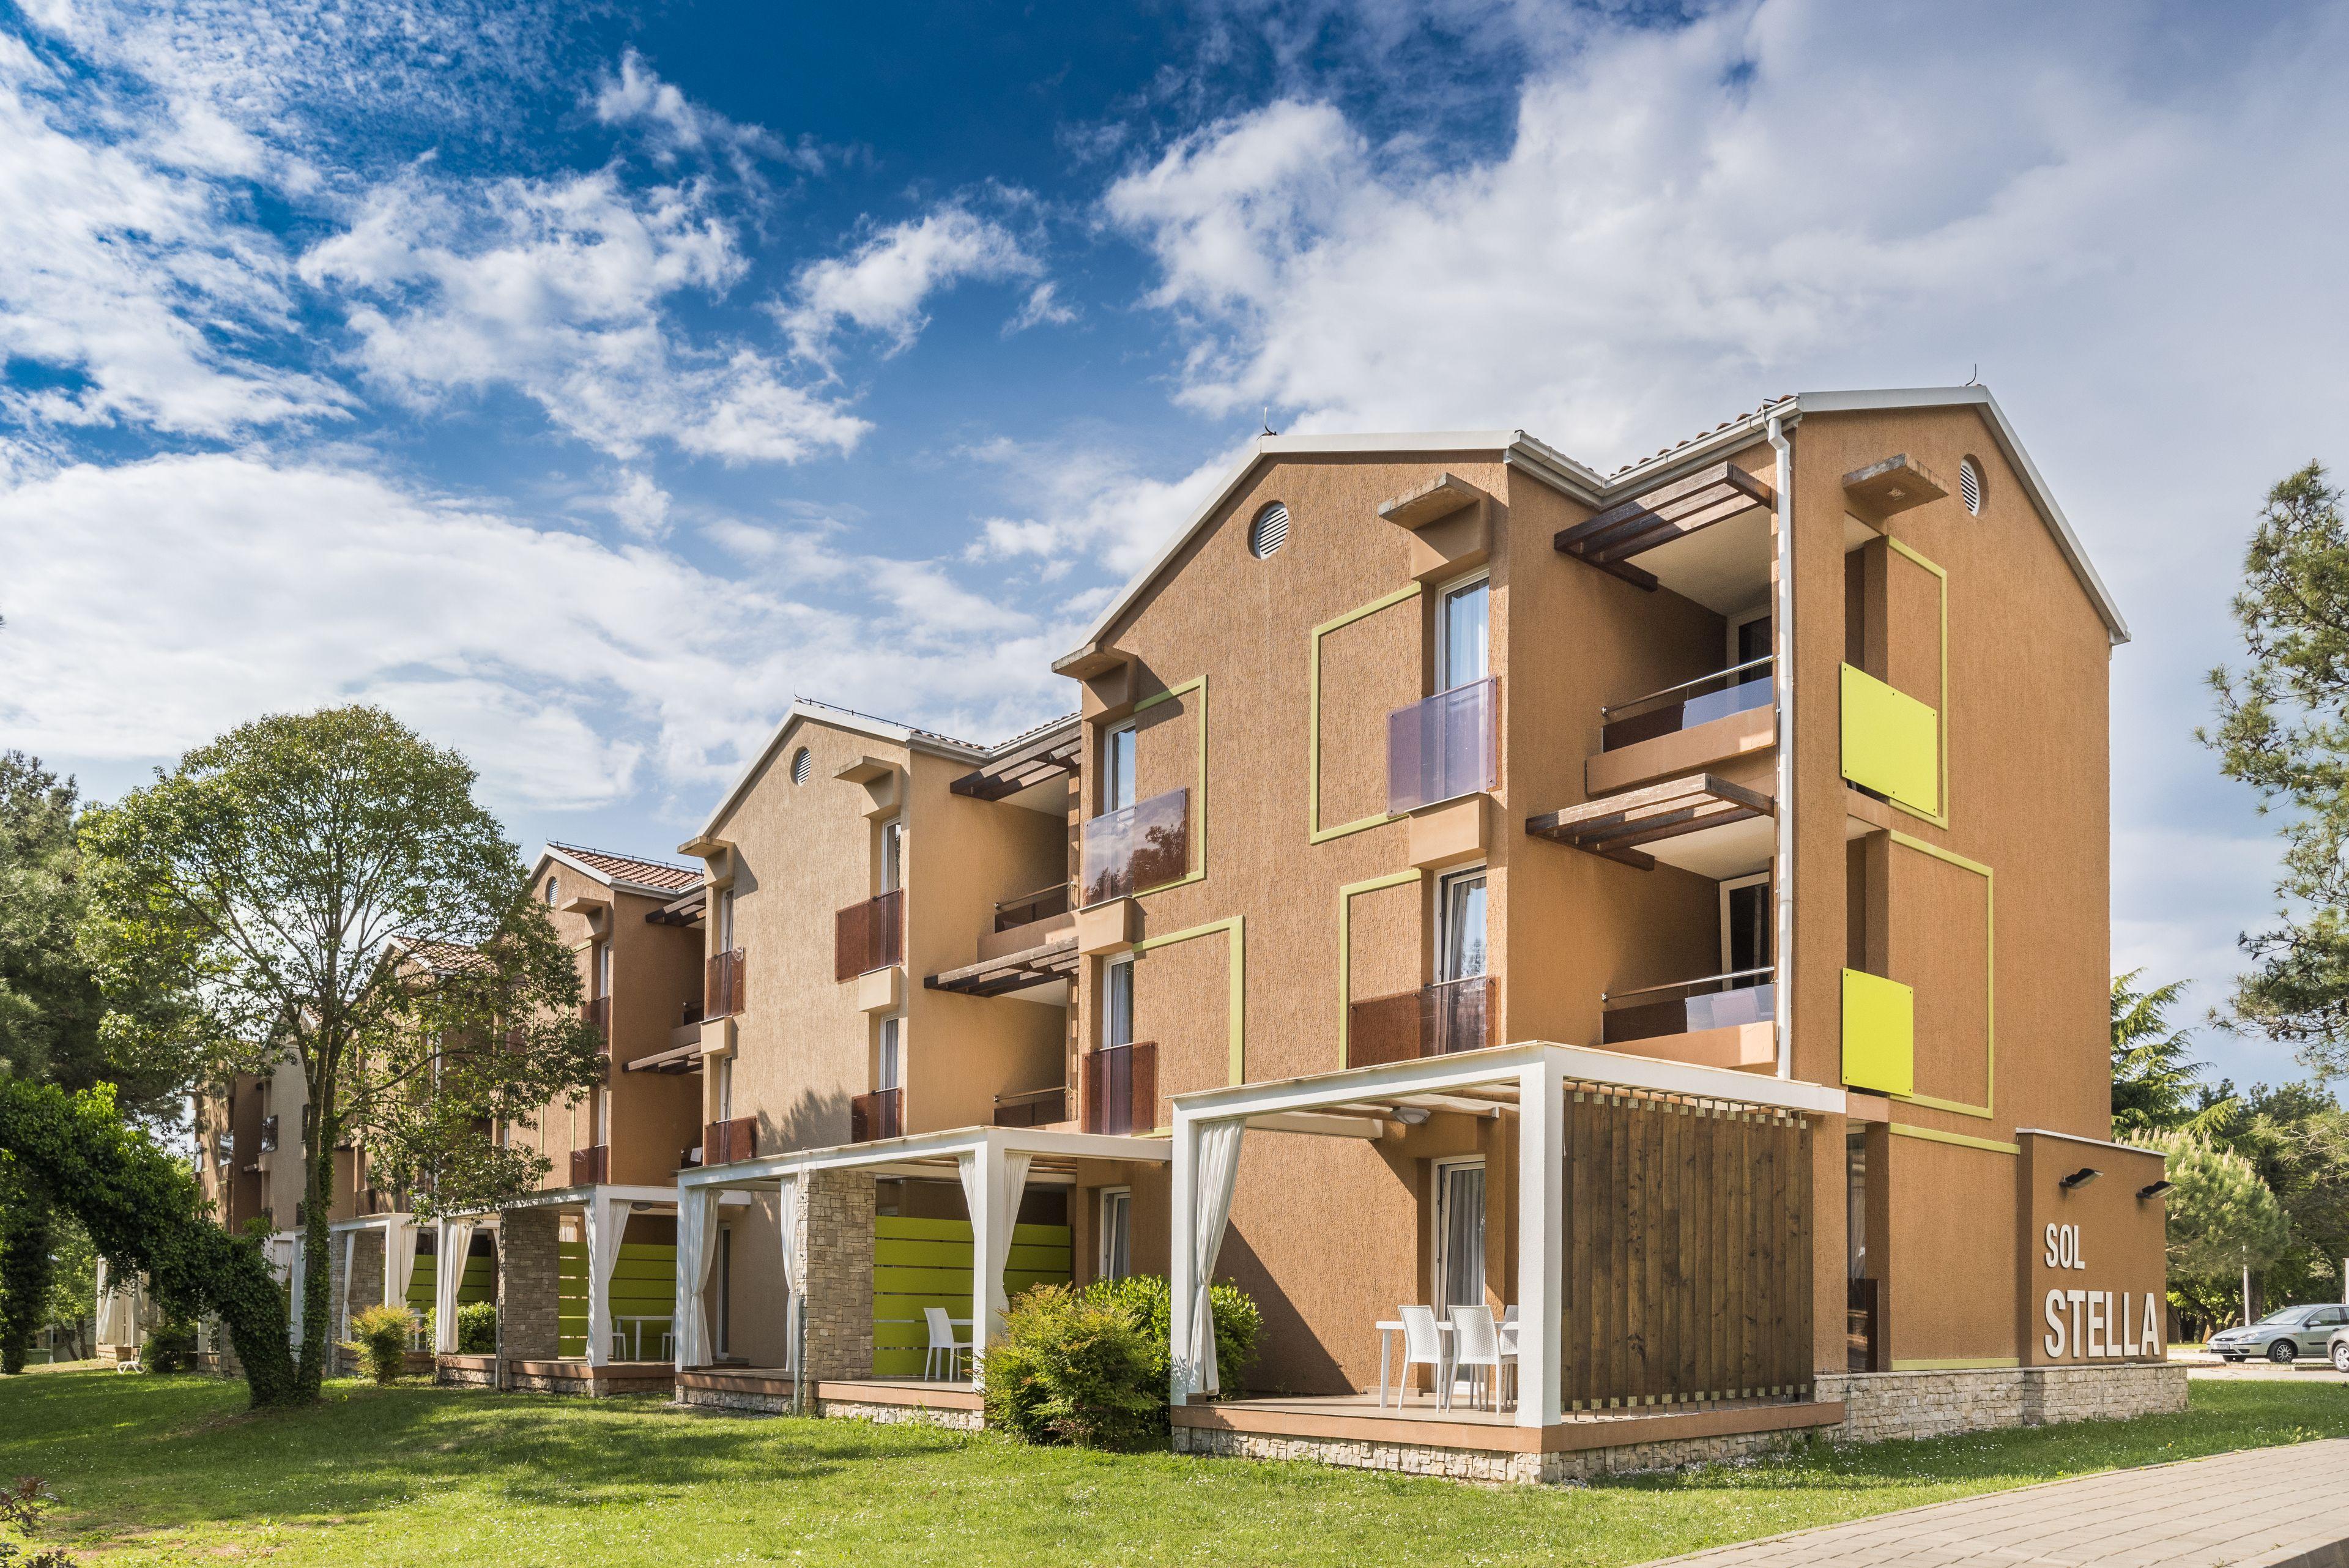 Apartments Sol Stella